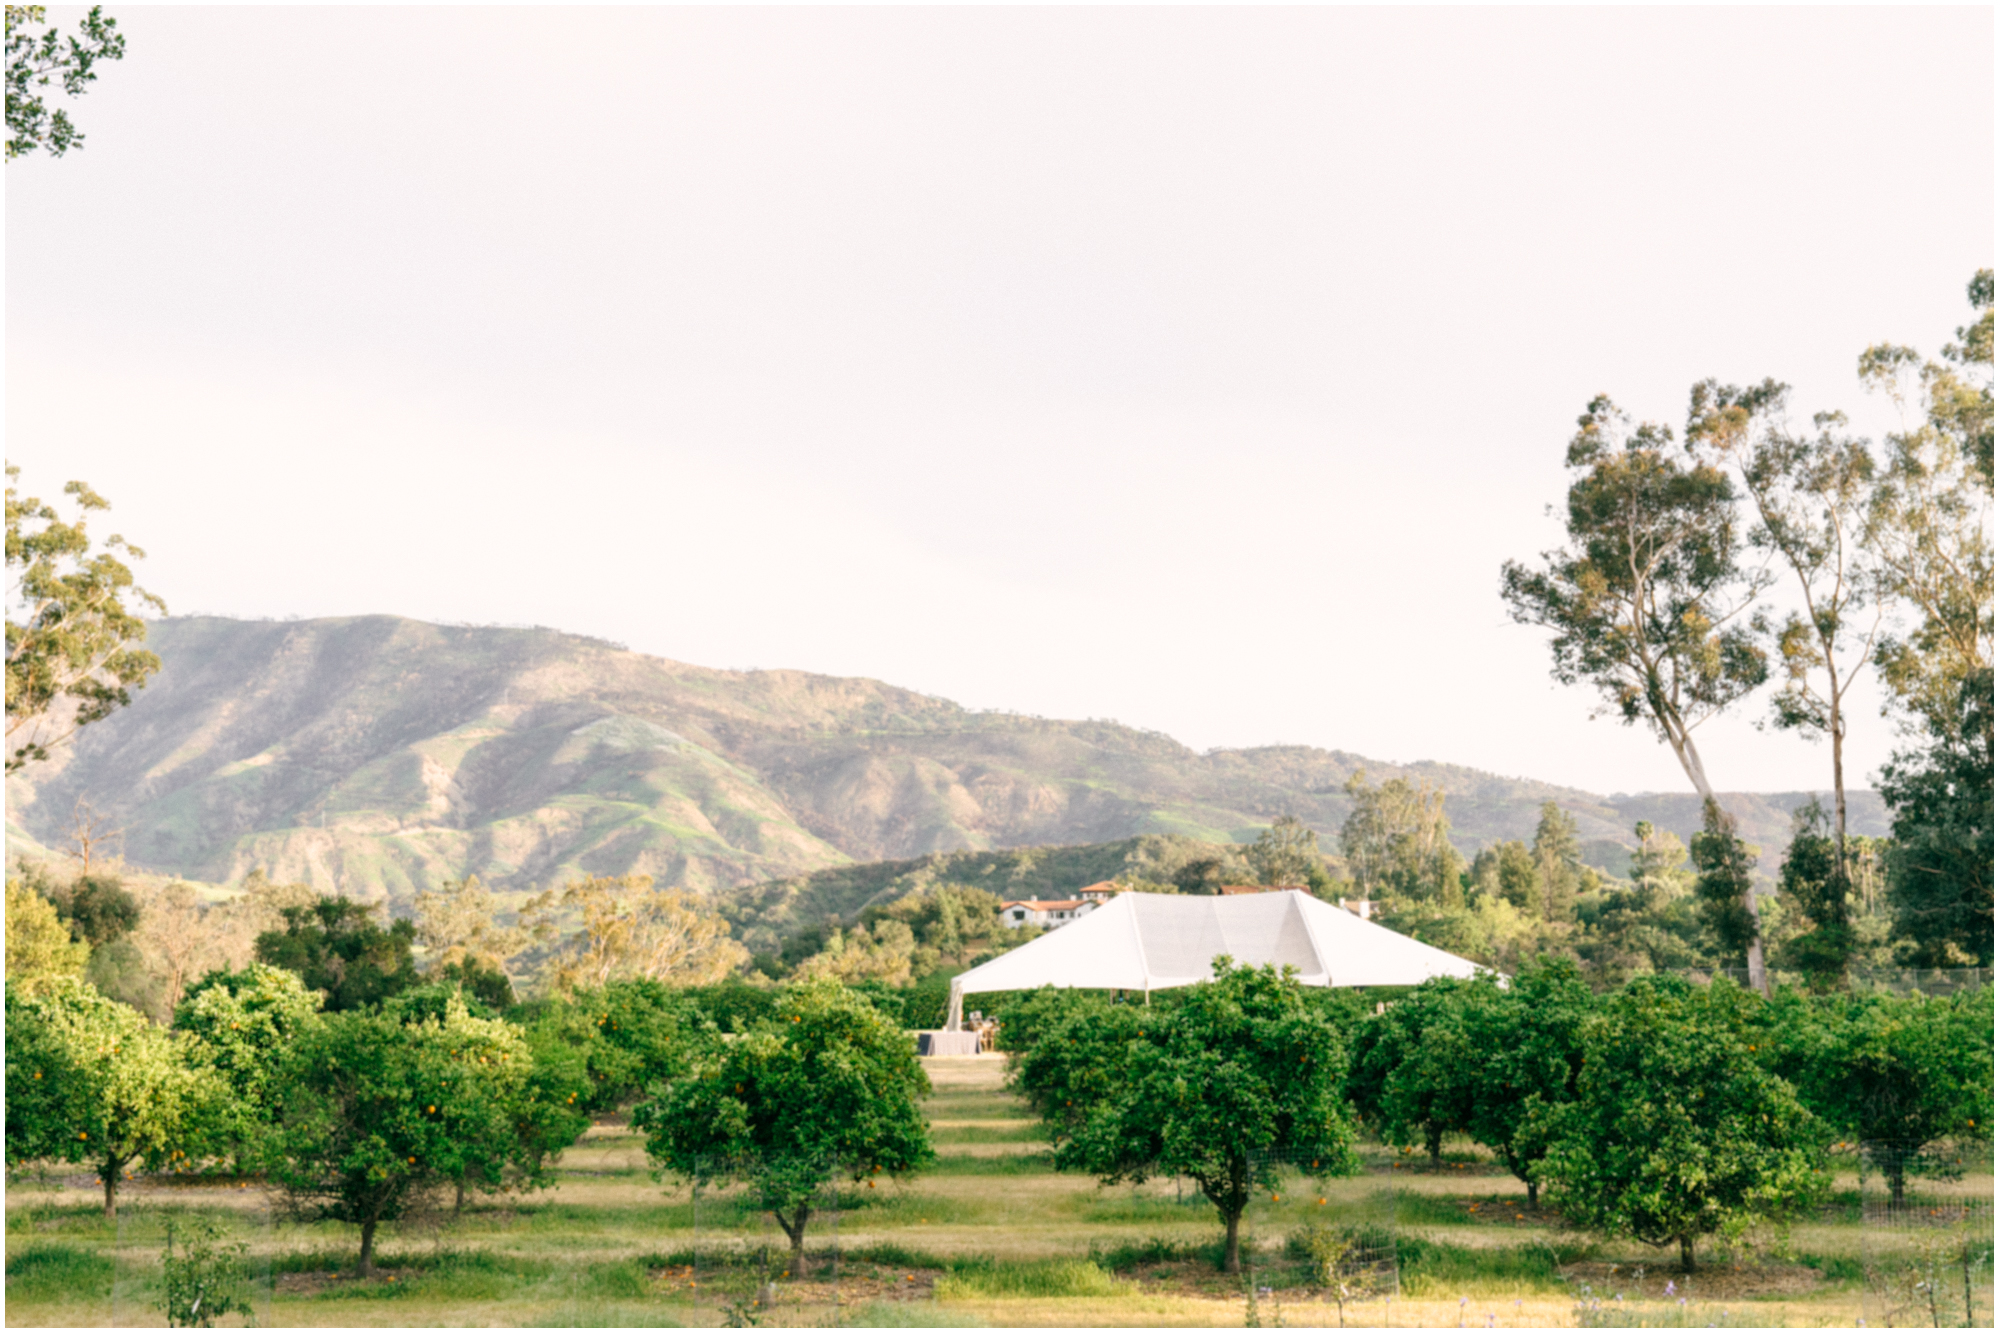 Los_Angeles_Wedding_Photographer_Ojai_Wedding_Pinnel_Photography-16.jpg